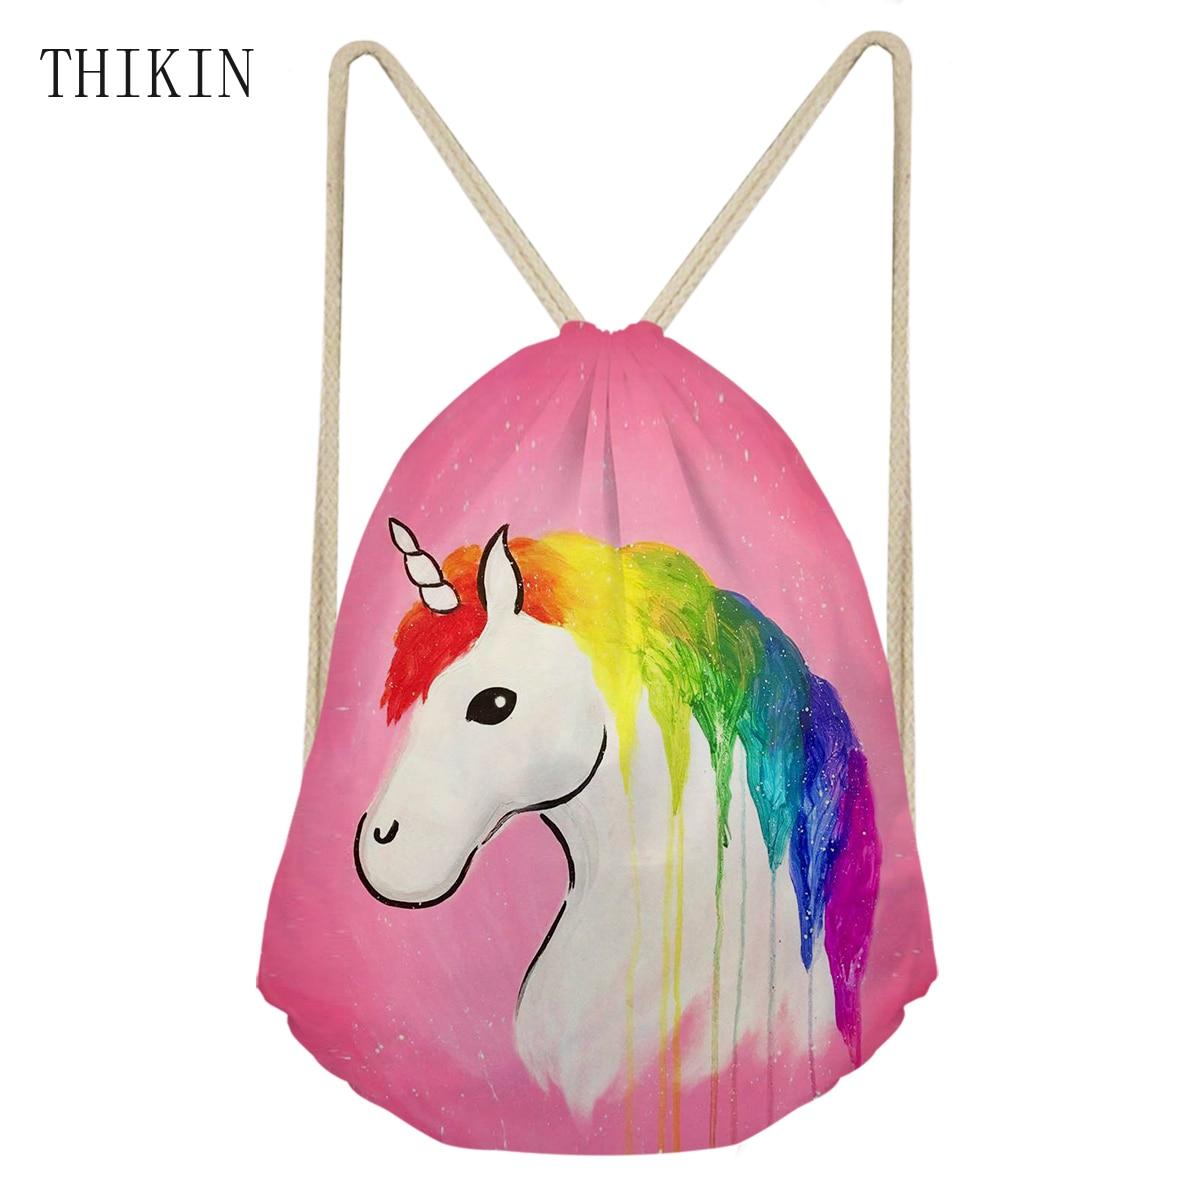 THIKIN Brand Women Rainbow Horse Unicorn Printing Sports Bag Waterproof Draw-string Swimming Bags Cartooon Backpack Bolsa Praia